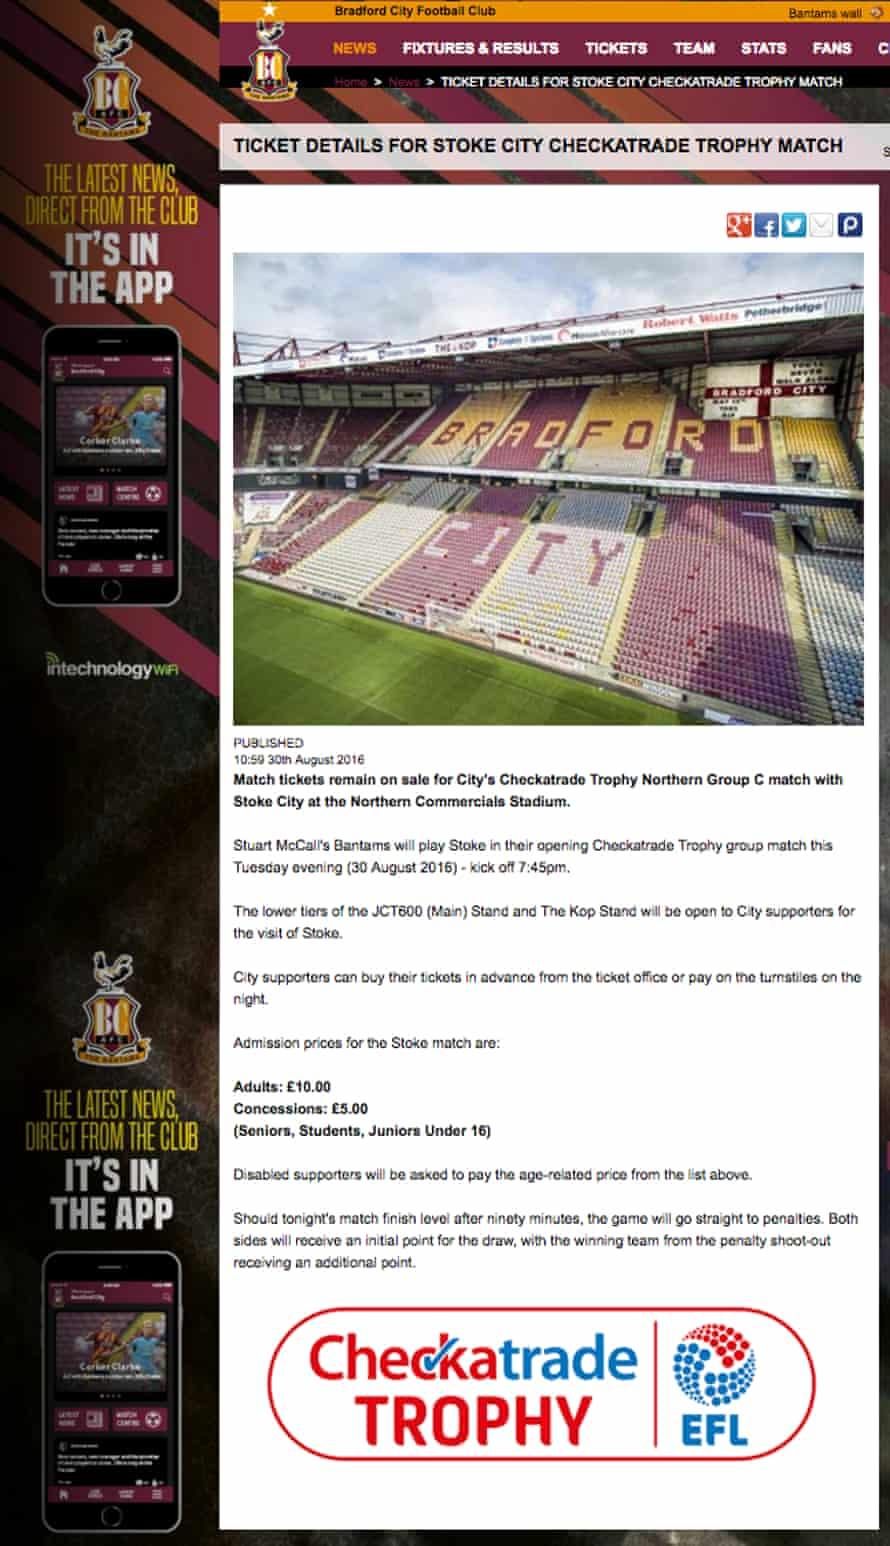 Bradford City website